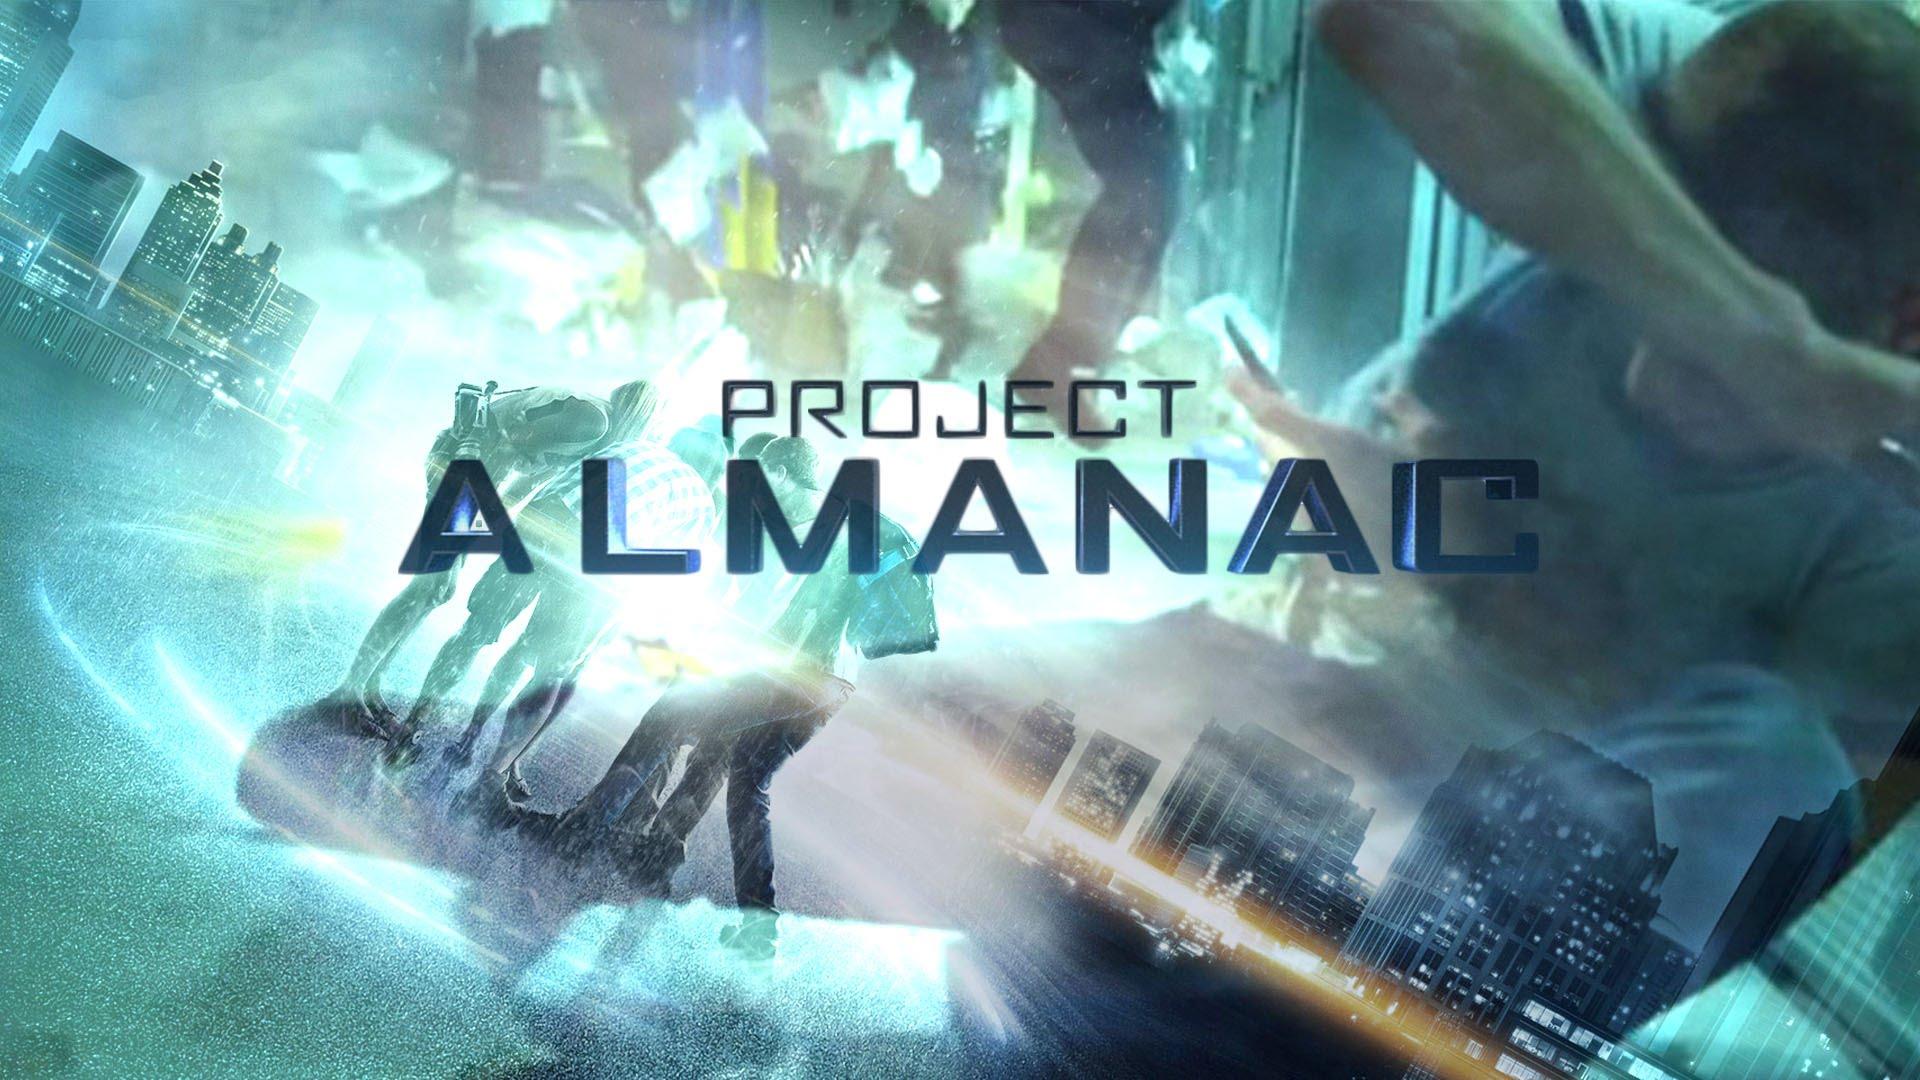 Project-Almanac-film-cover-photo.jpg